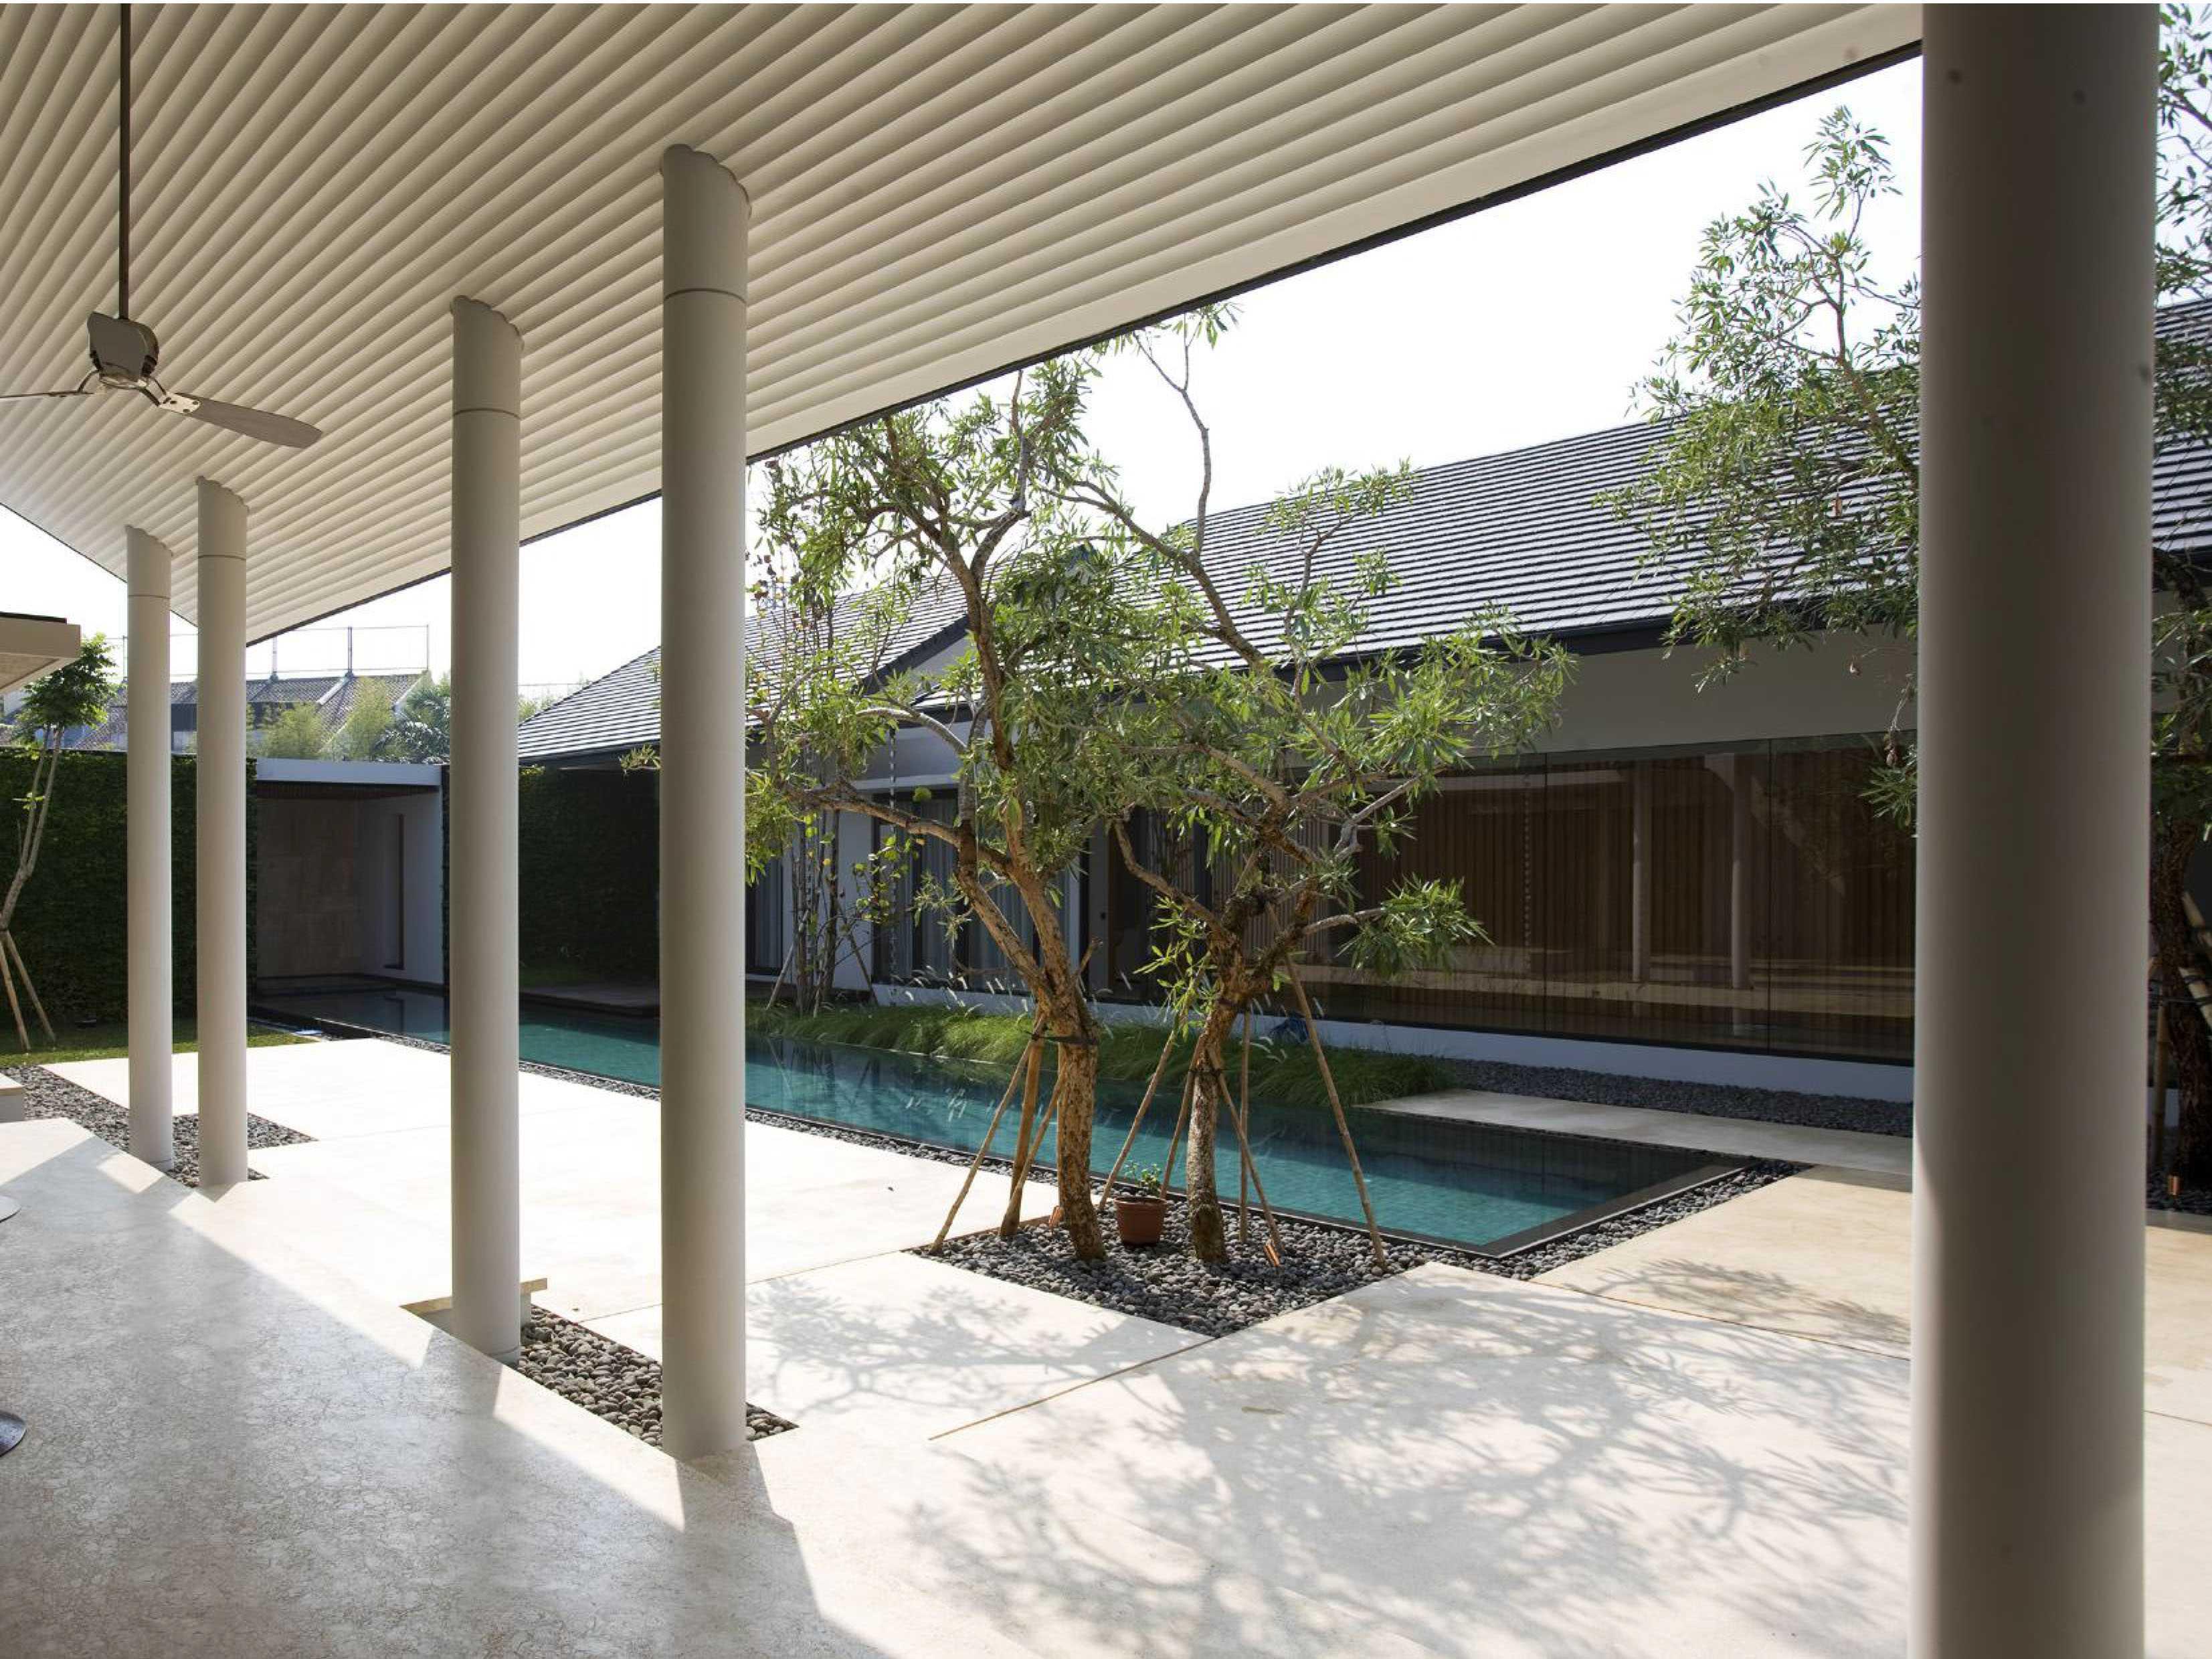 Studio Air Putih P_House Bsd, Serpong Bsd, Serpong Swimming Pool View   25062